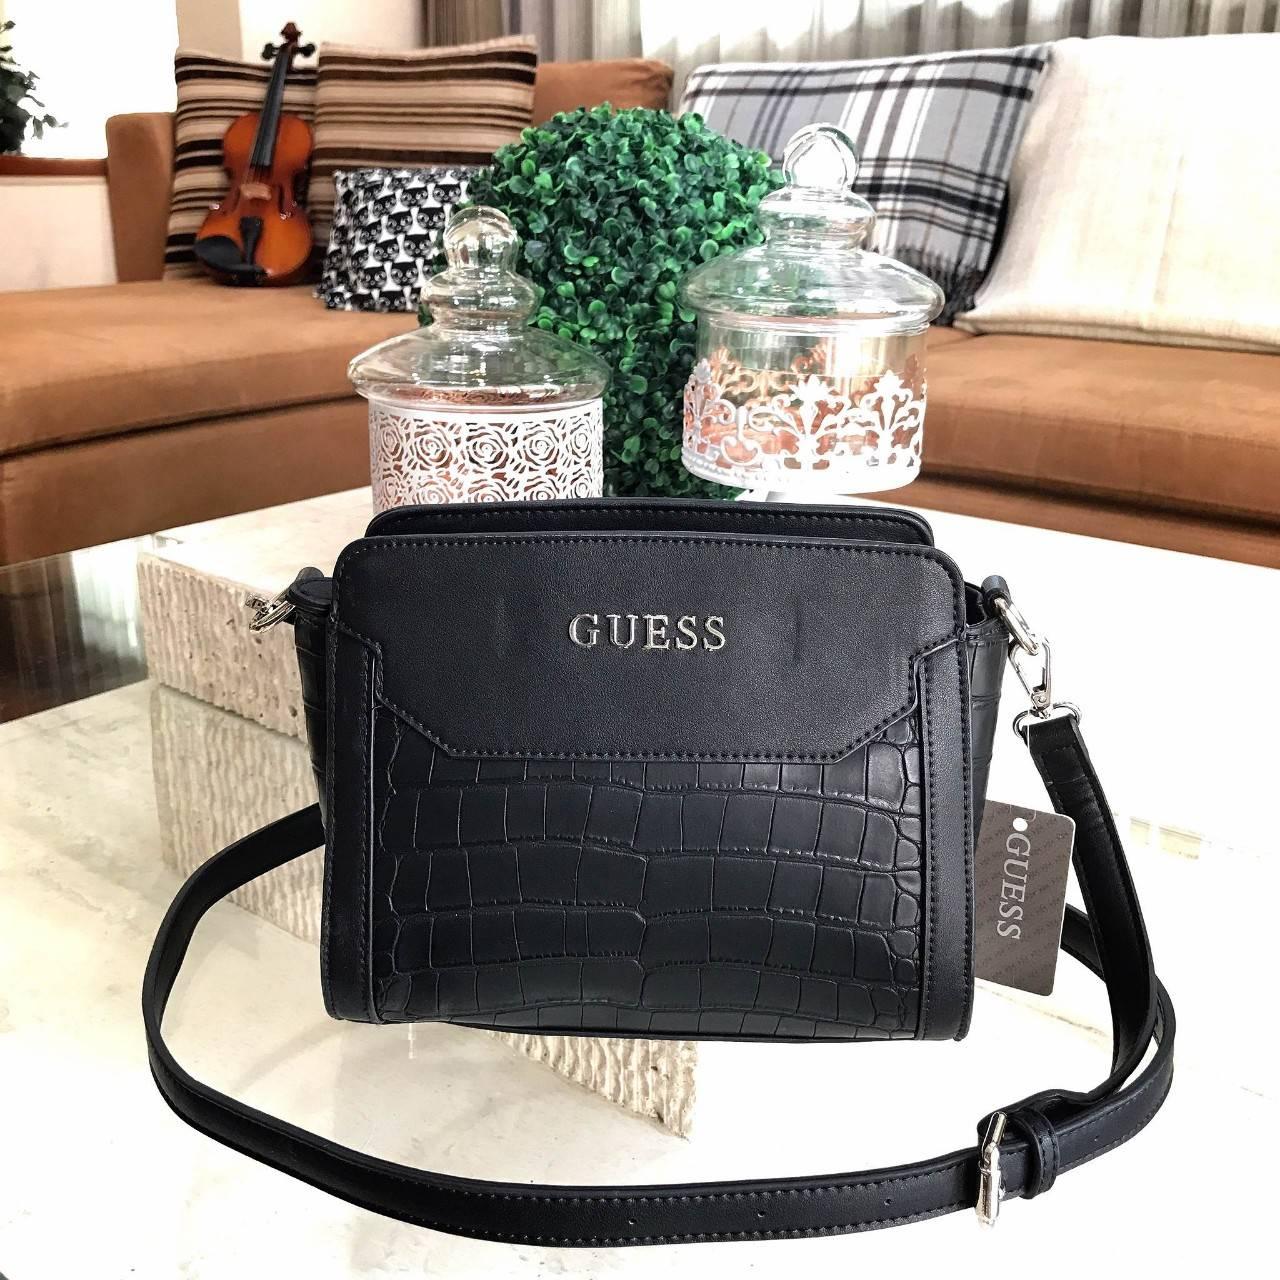 GUESS CROC SHOULDER BAG 2017 กระเป๋าสะพายรุ่นใหม่ล่าสุดจาก GUESS